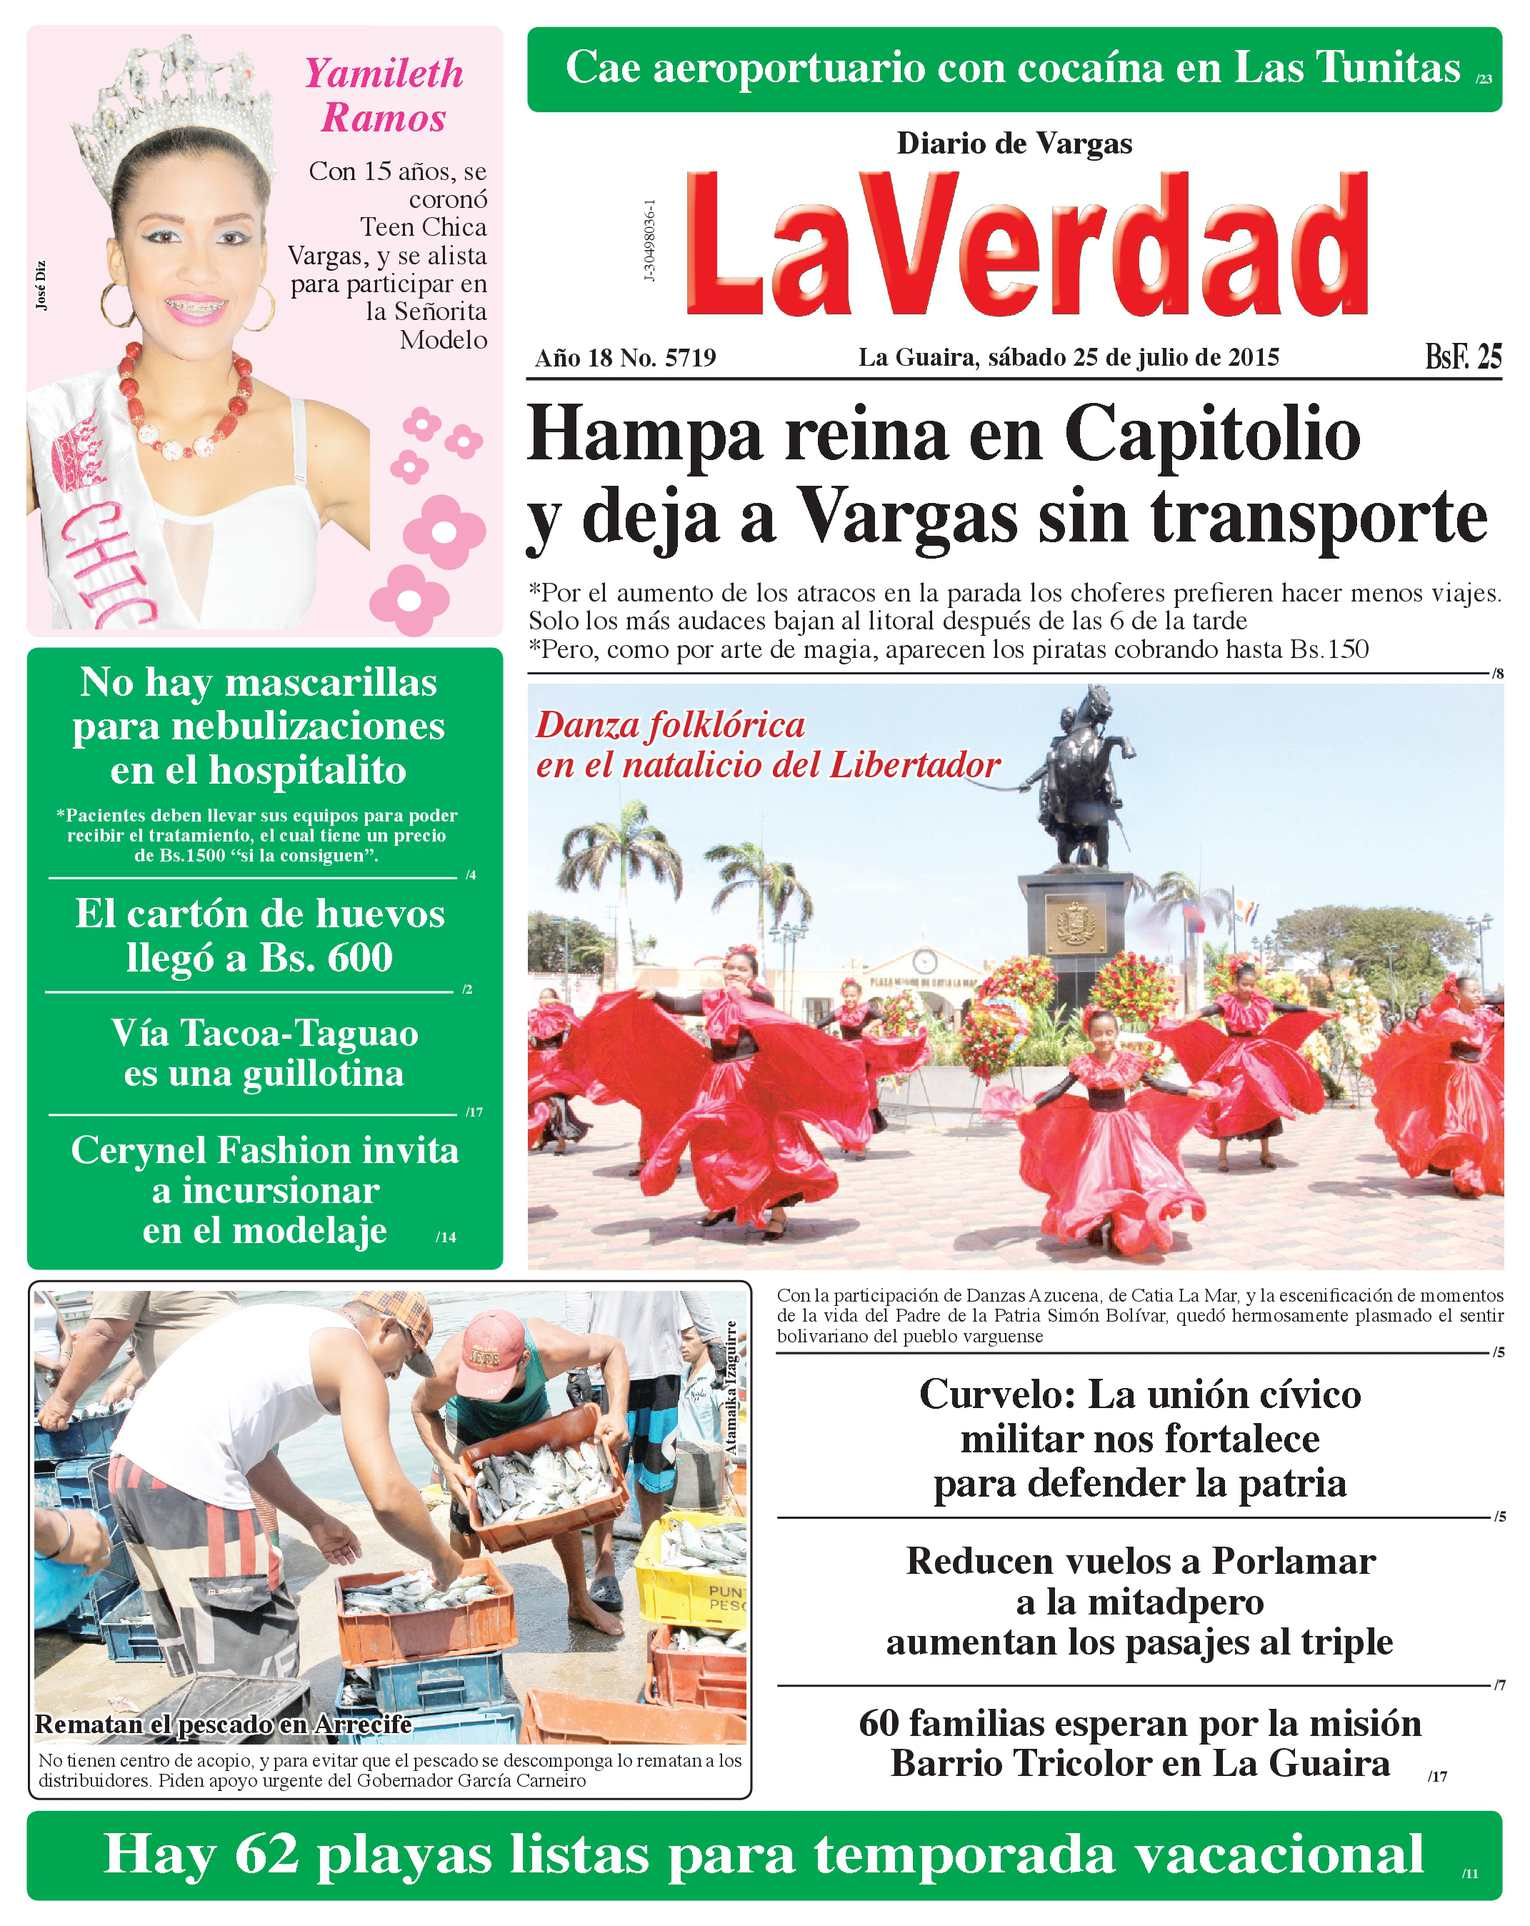 e1284a39f4cf Calaméo - La Guaira, sábado 25 de julio de 2015 Año 18 No. 5719